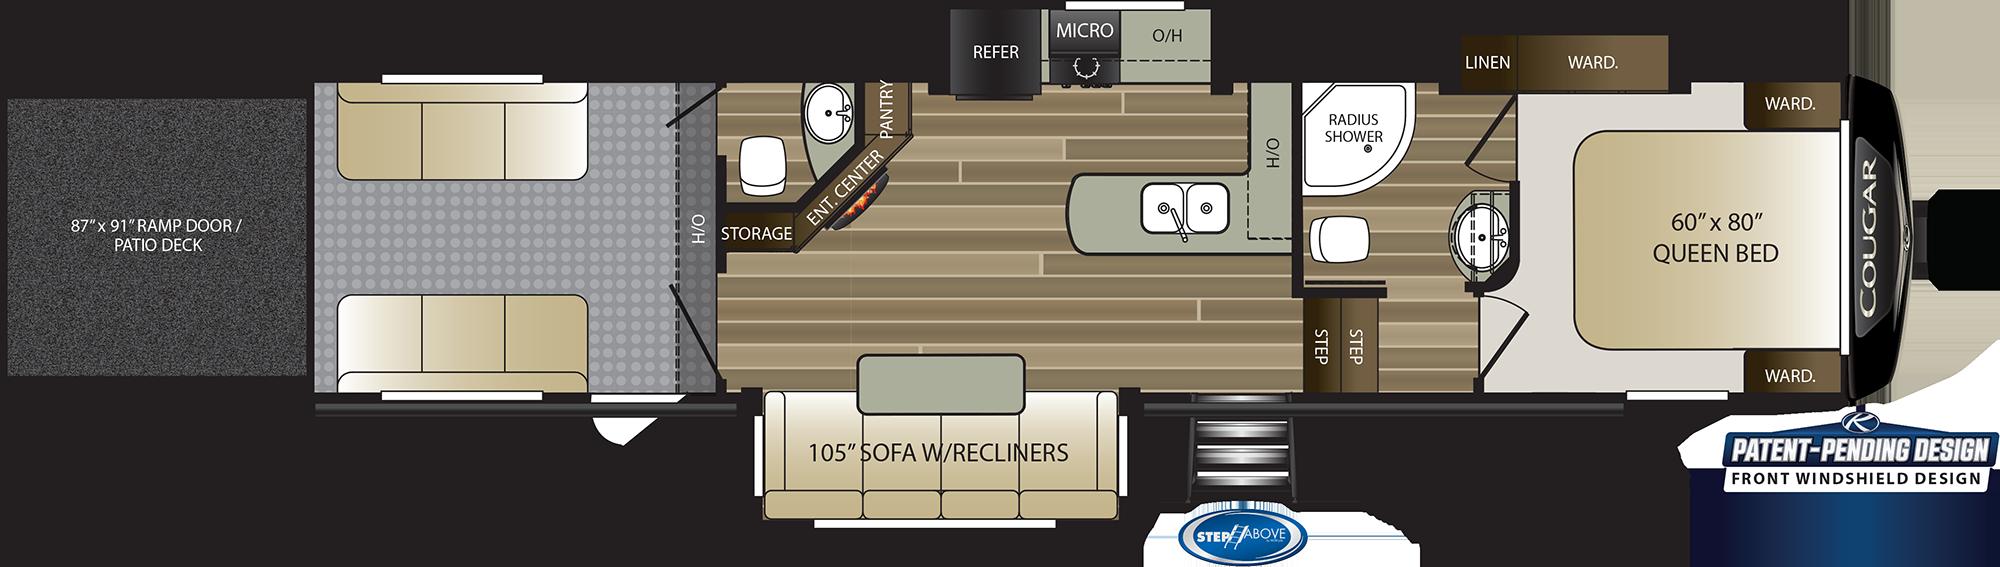 2020 KEYSTONE COUGAR 353SRX (bunks) Floorplan